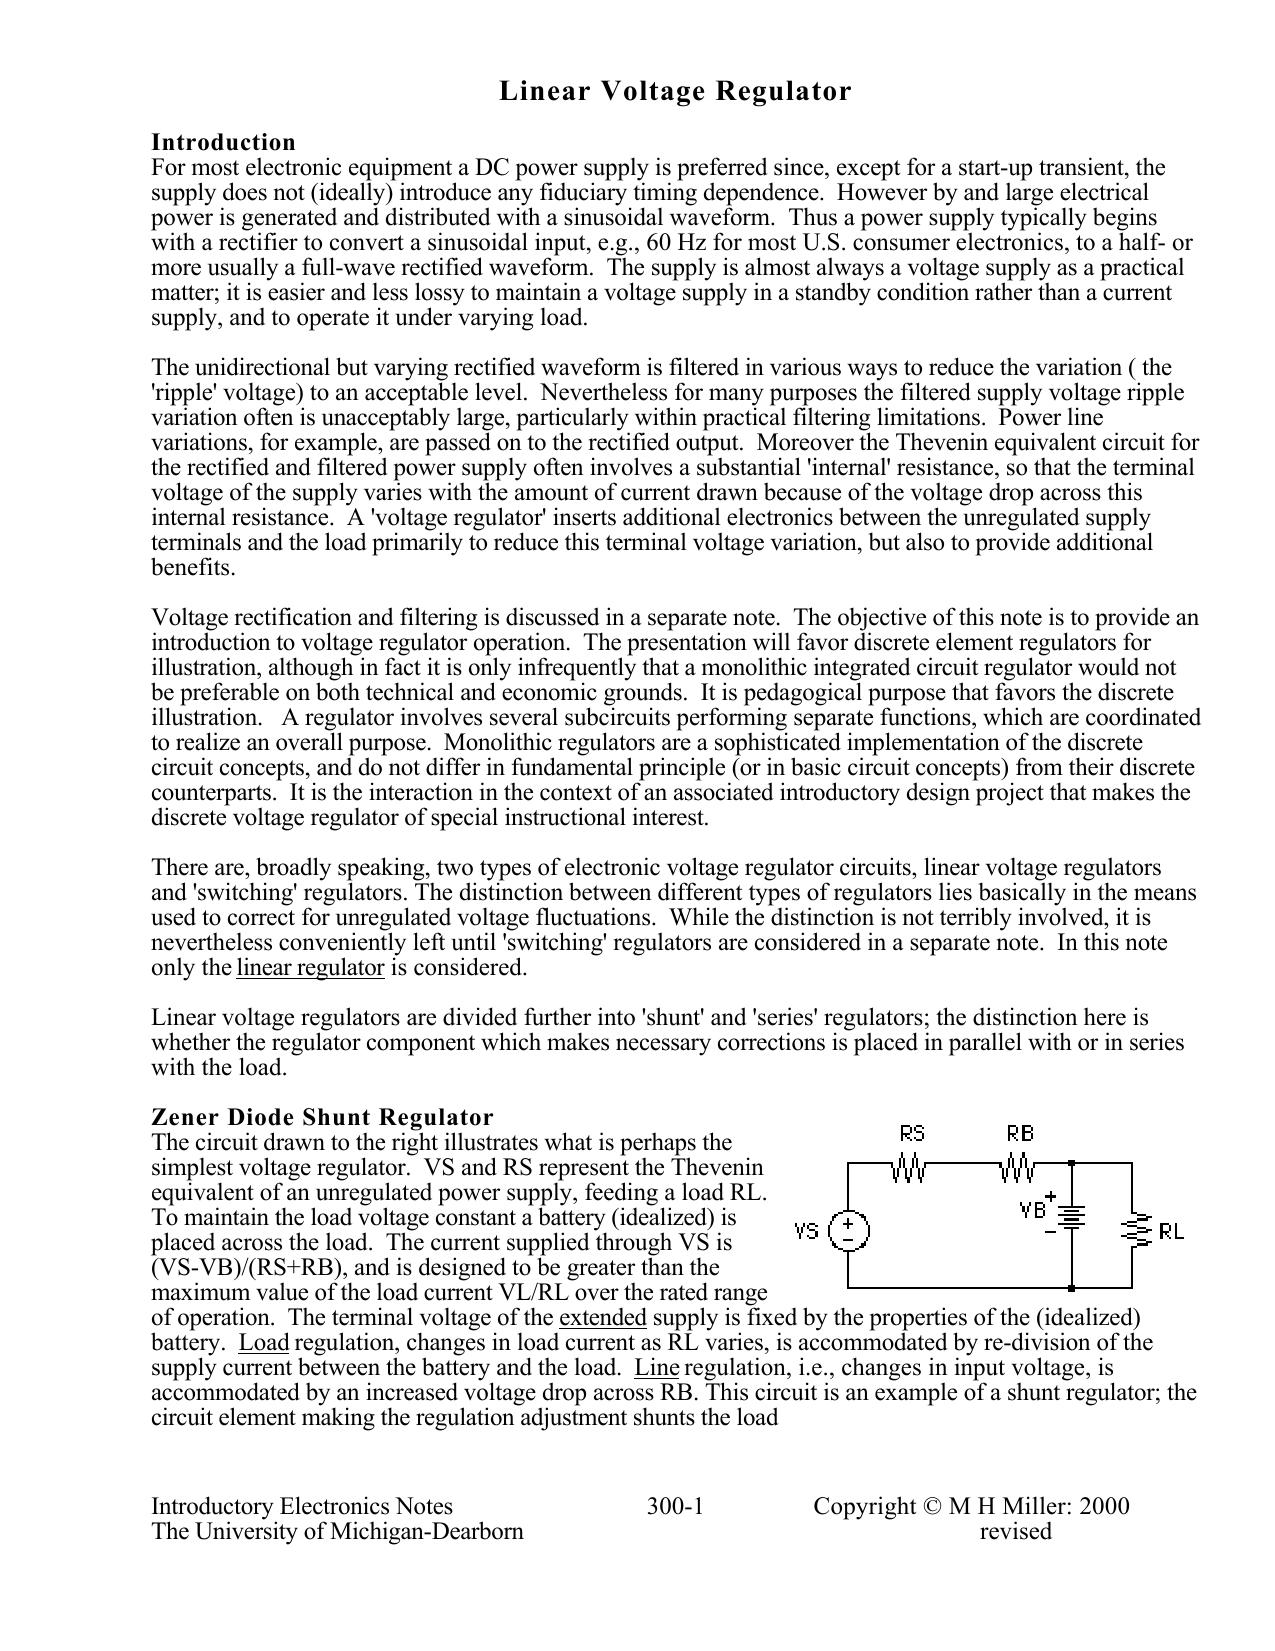 Linear Voltage Regulator Psu Diagram Furthermore Shunt Circuit 018668756 1 D3b664b1d0613e9e2acbd0221710f590